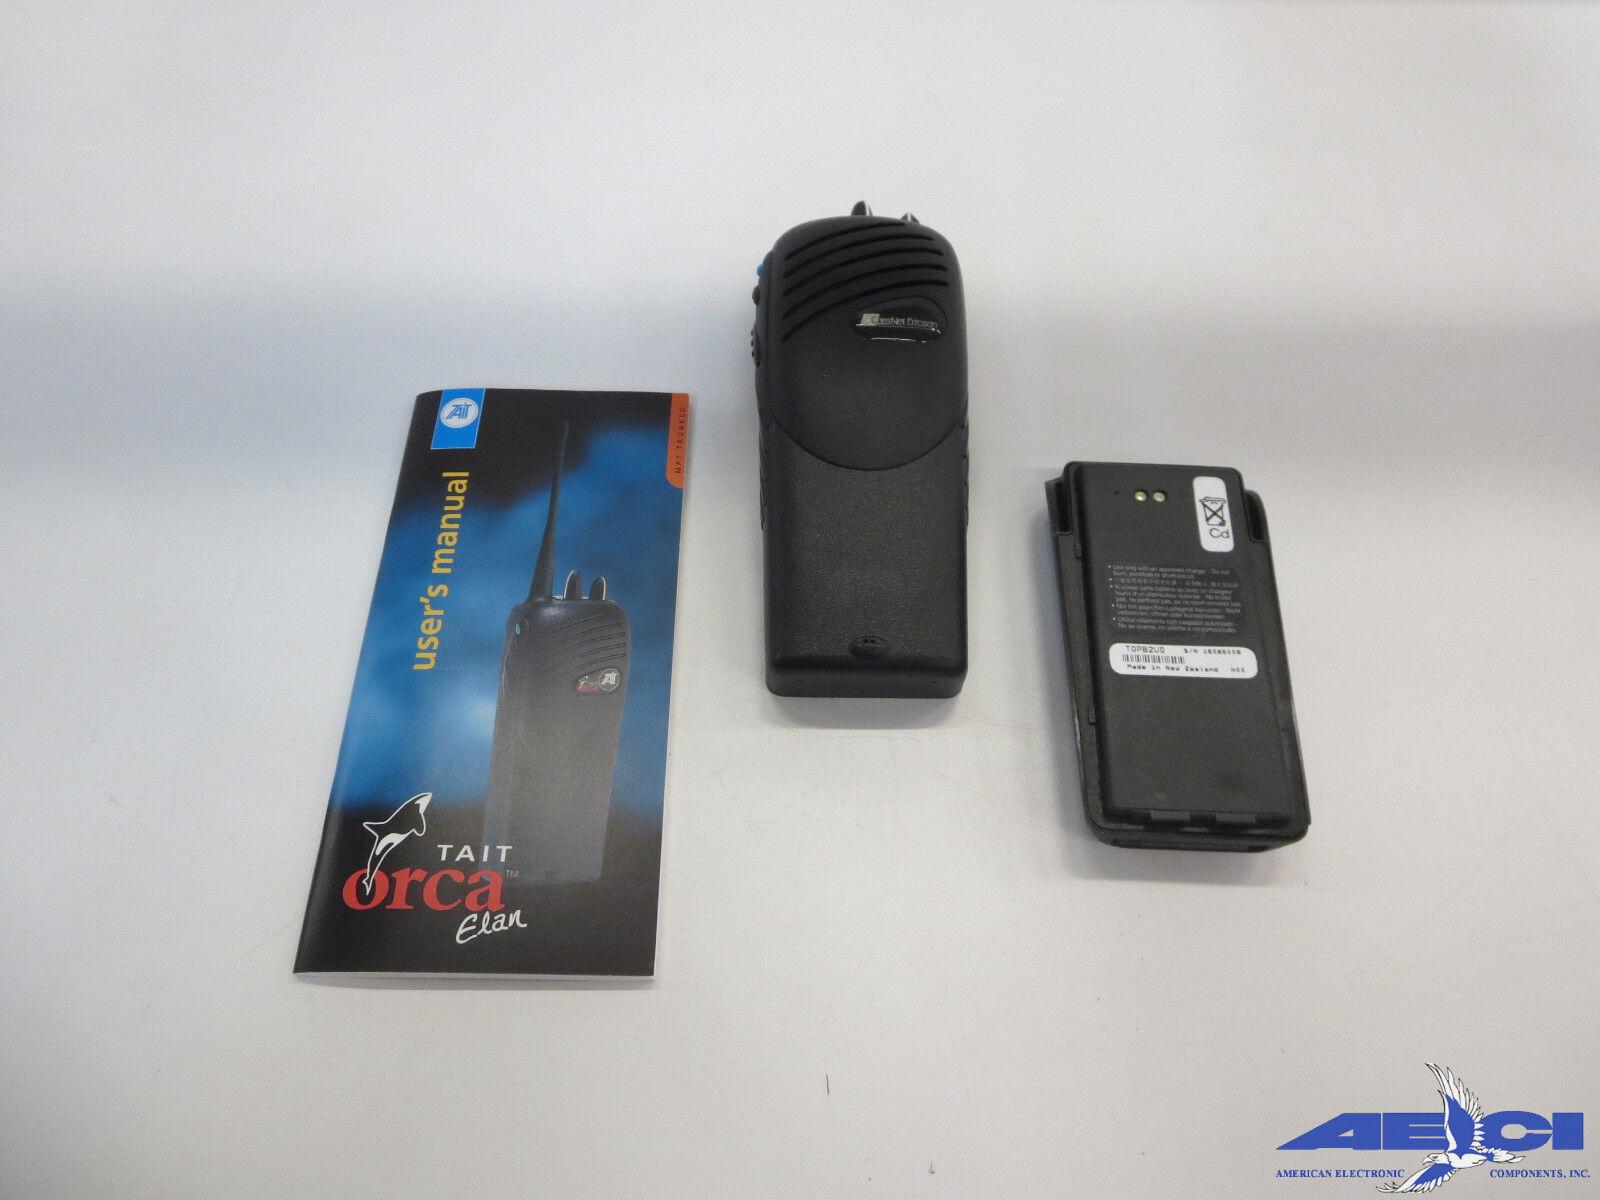 Ericsson Gt400utx Cougar 400p Mpt1327 Portable Radio Freq...